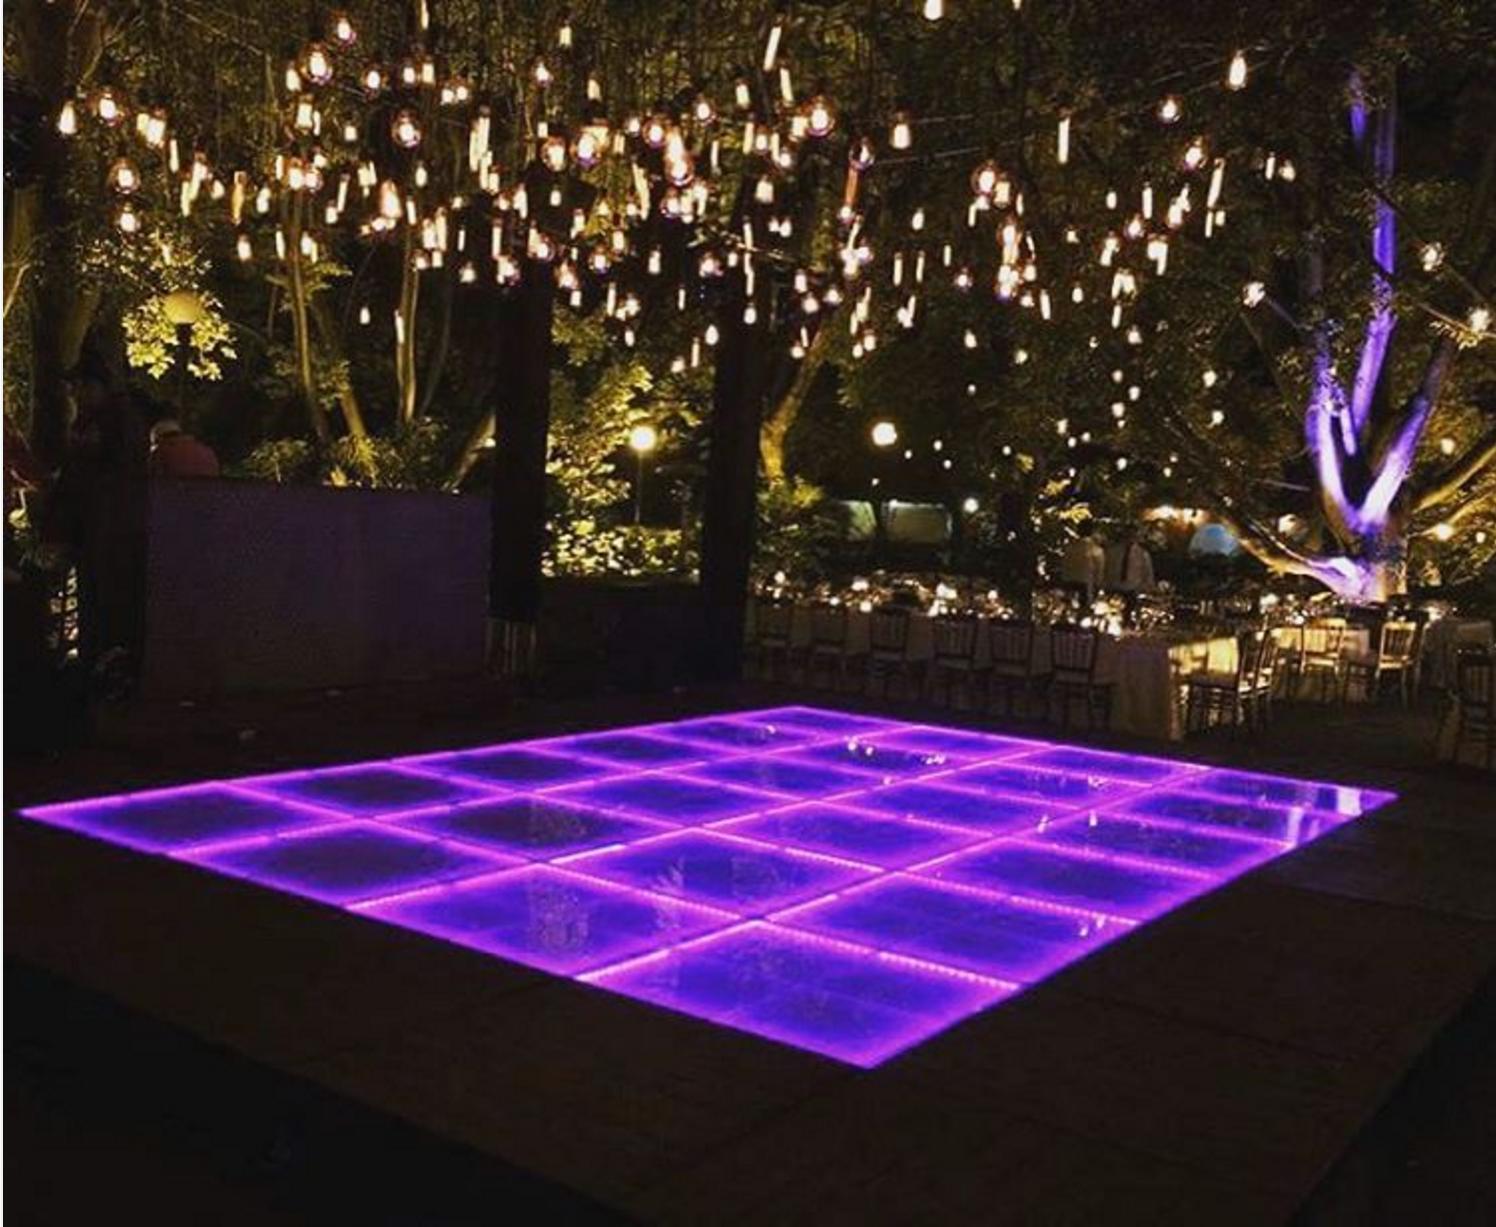 101 fiestas 12 ideas de iluminaci n para tu fiesta - Ideas fiesta inauguracion piso ...